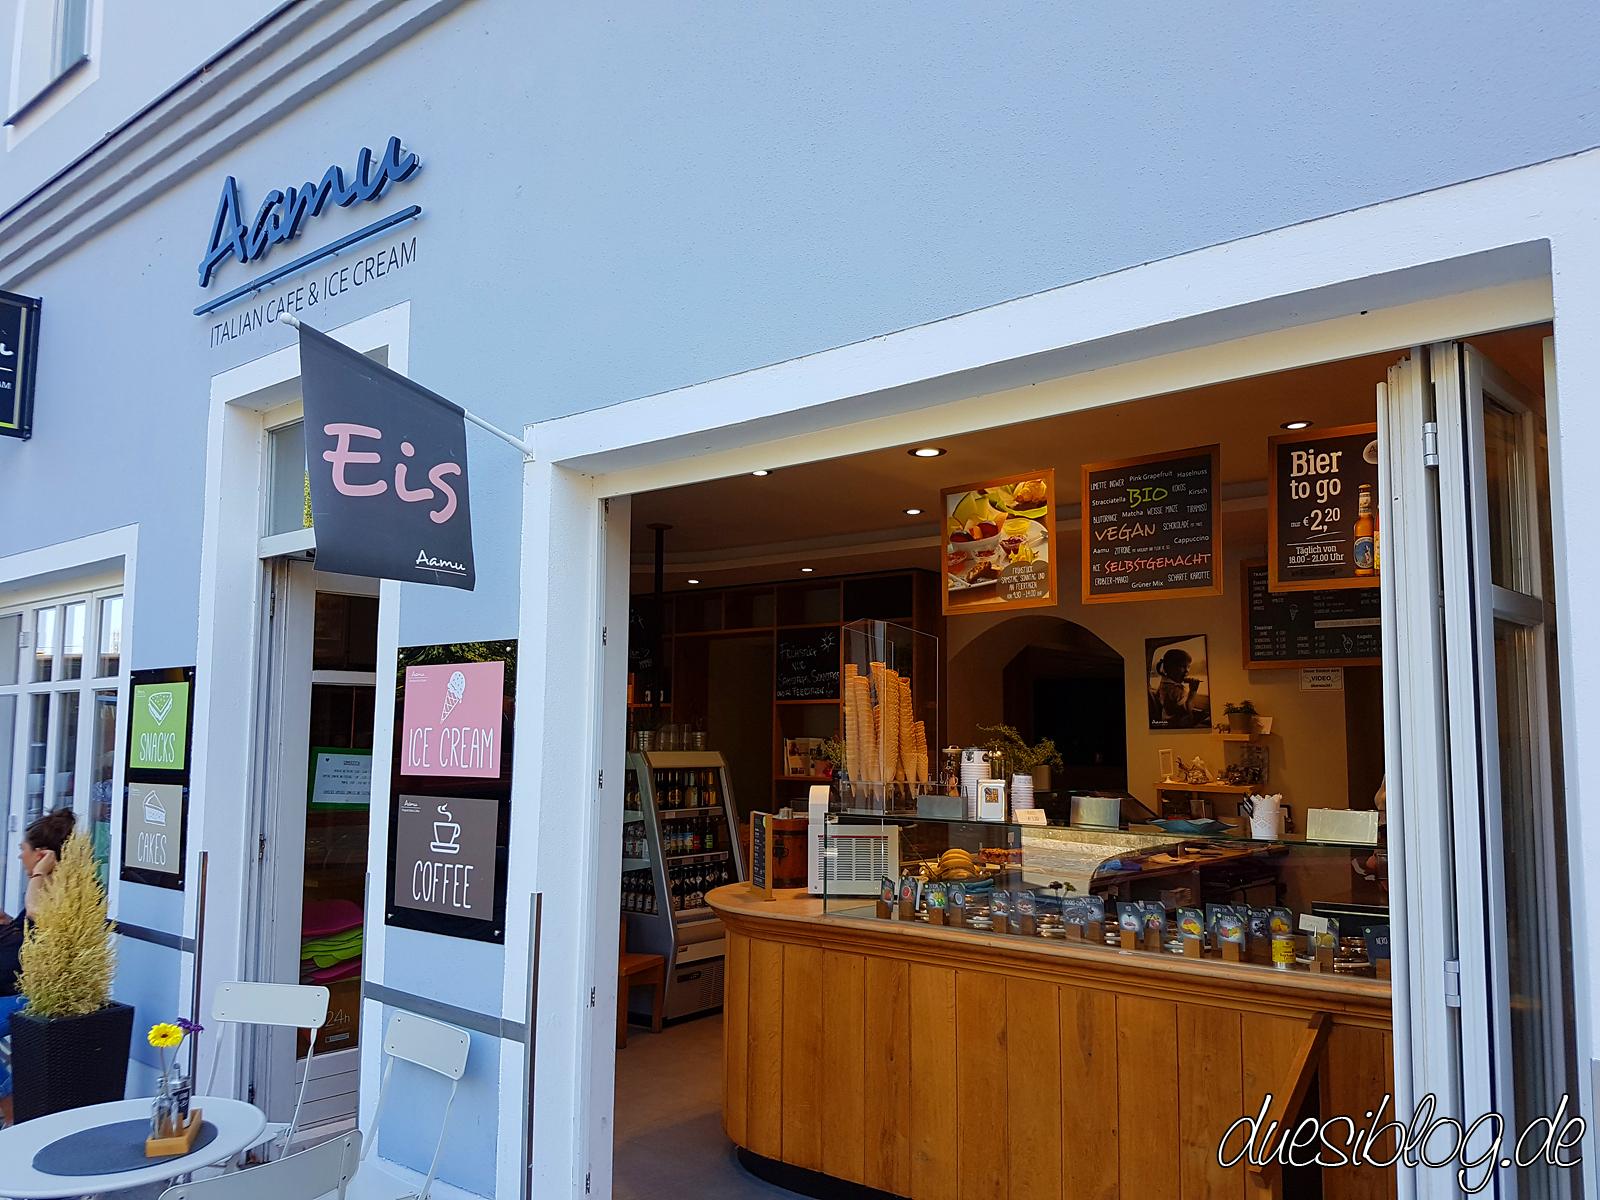 Regensburg vegan Travelblog duesiblog 10